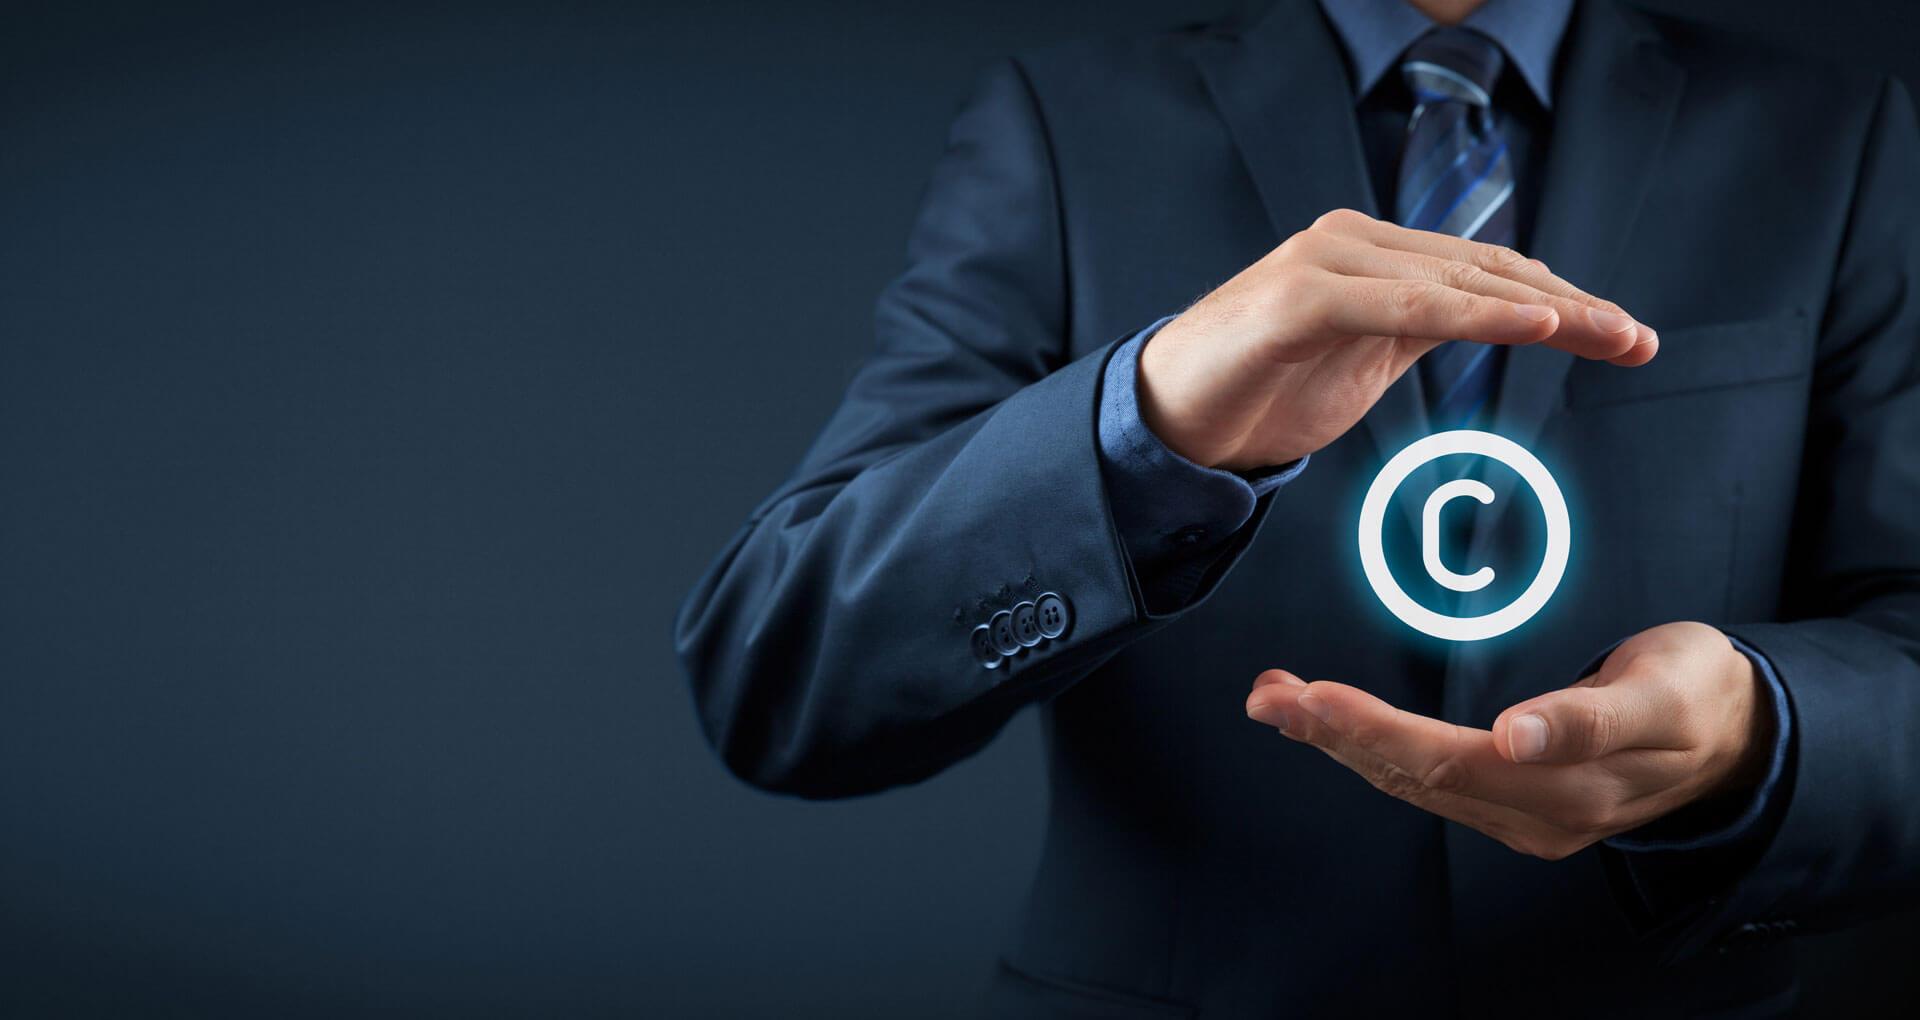 Unauthorised use of domain names